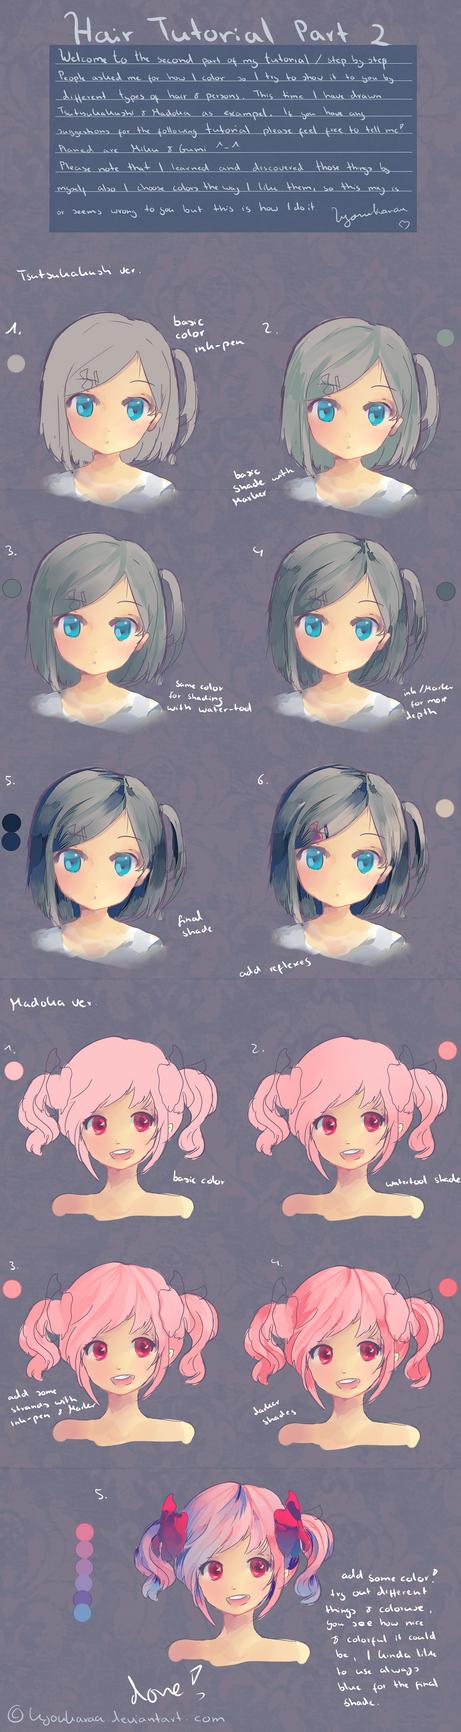 Hair Tutorial Part 2 by KyouKaraa